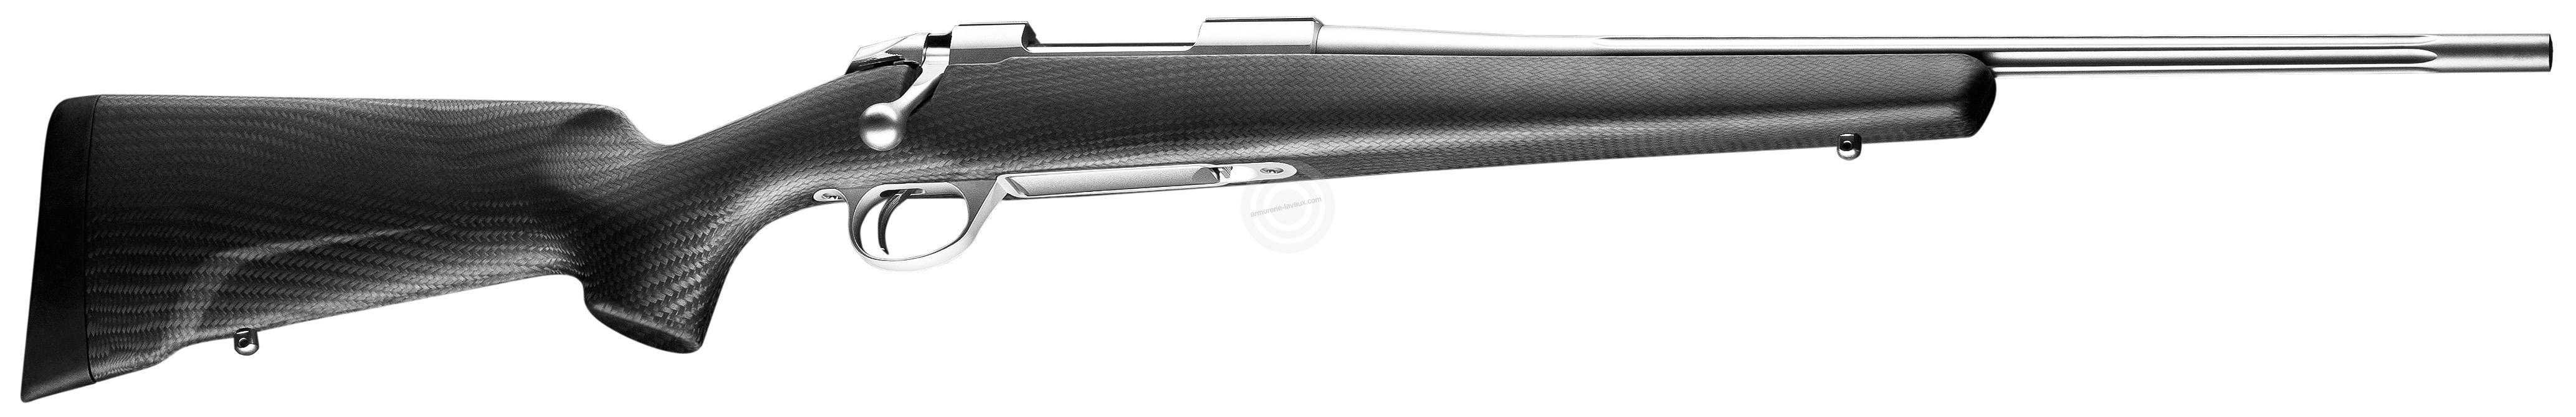 Carabine SAKO 85 Carbonlight